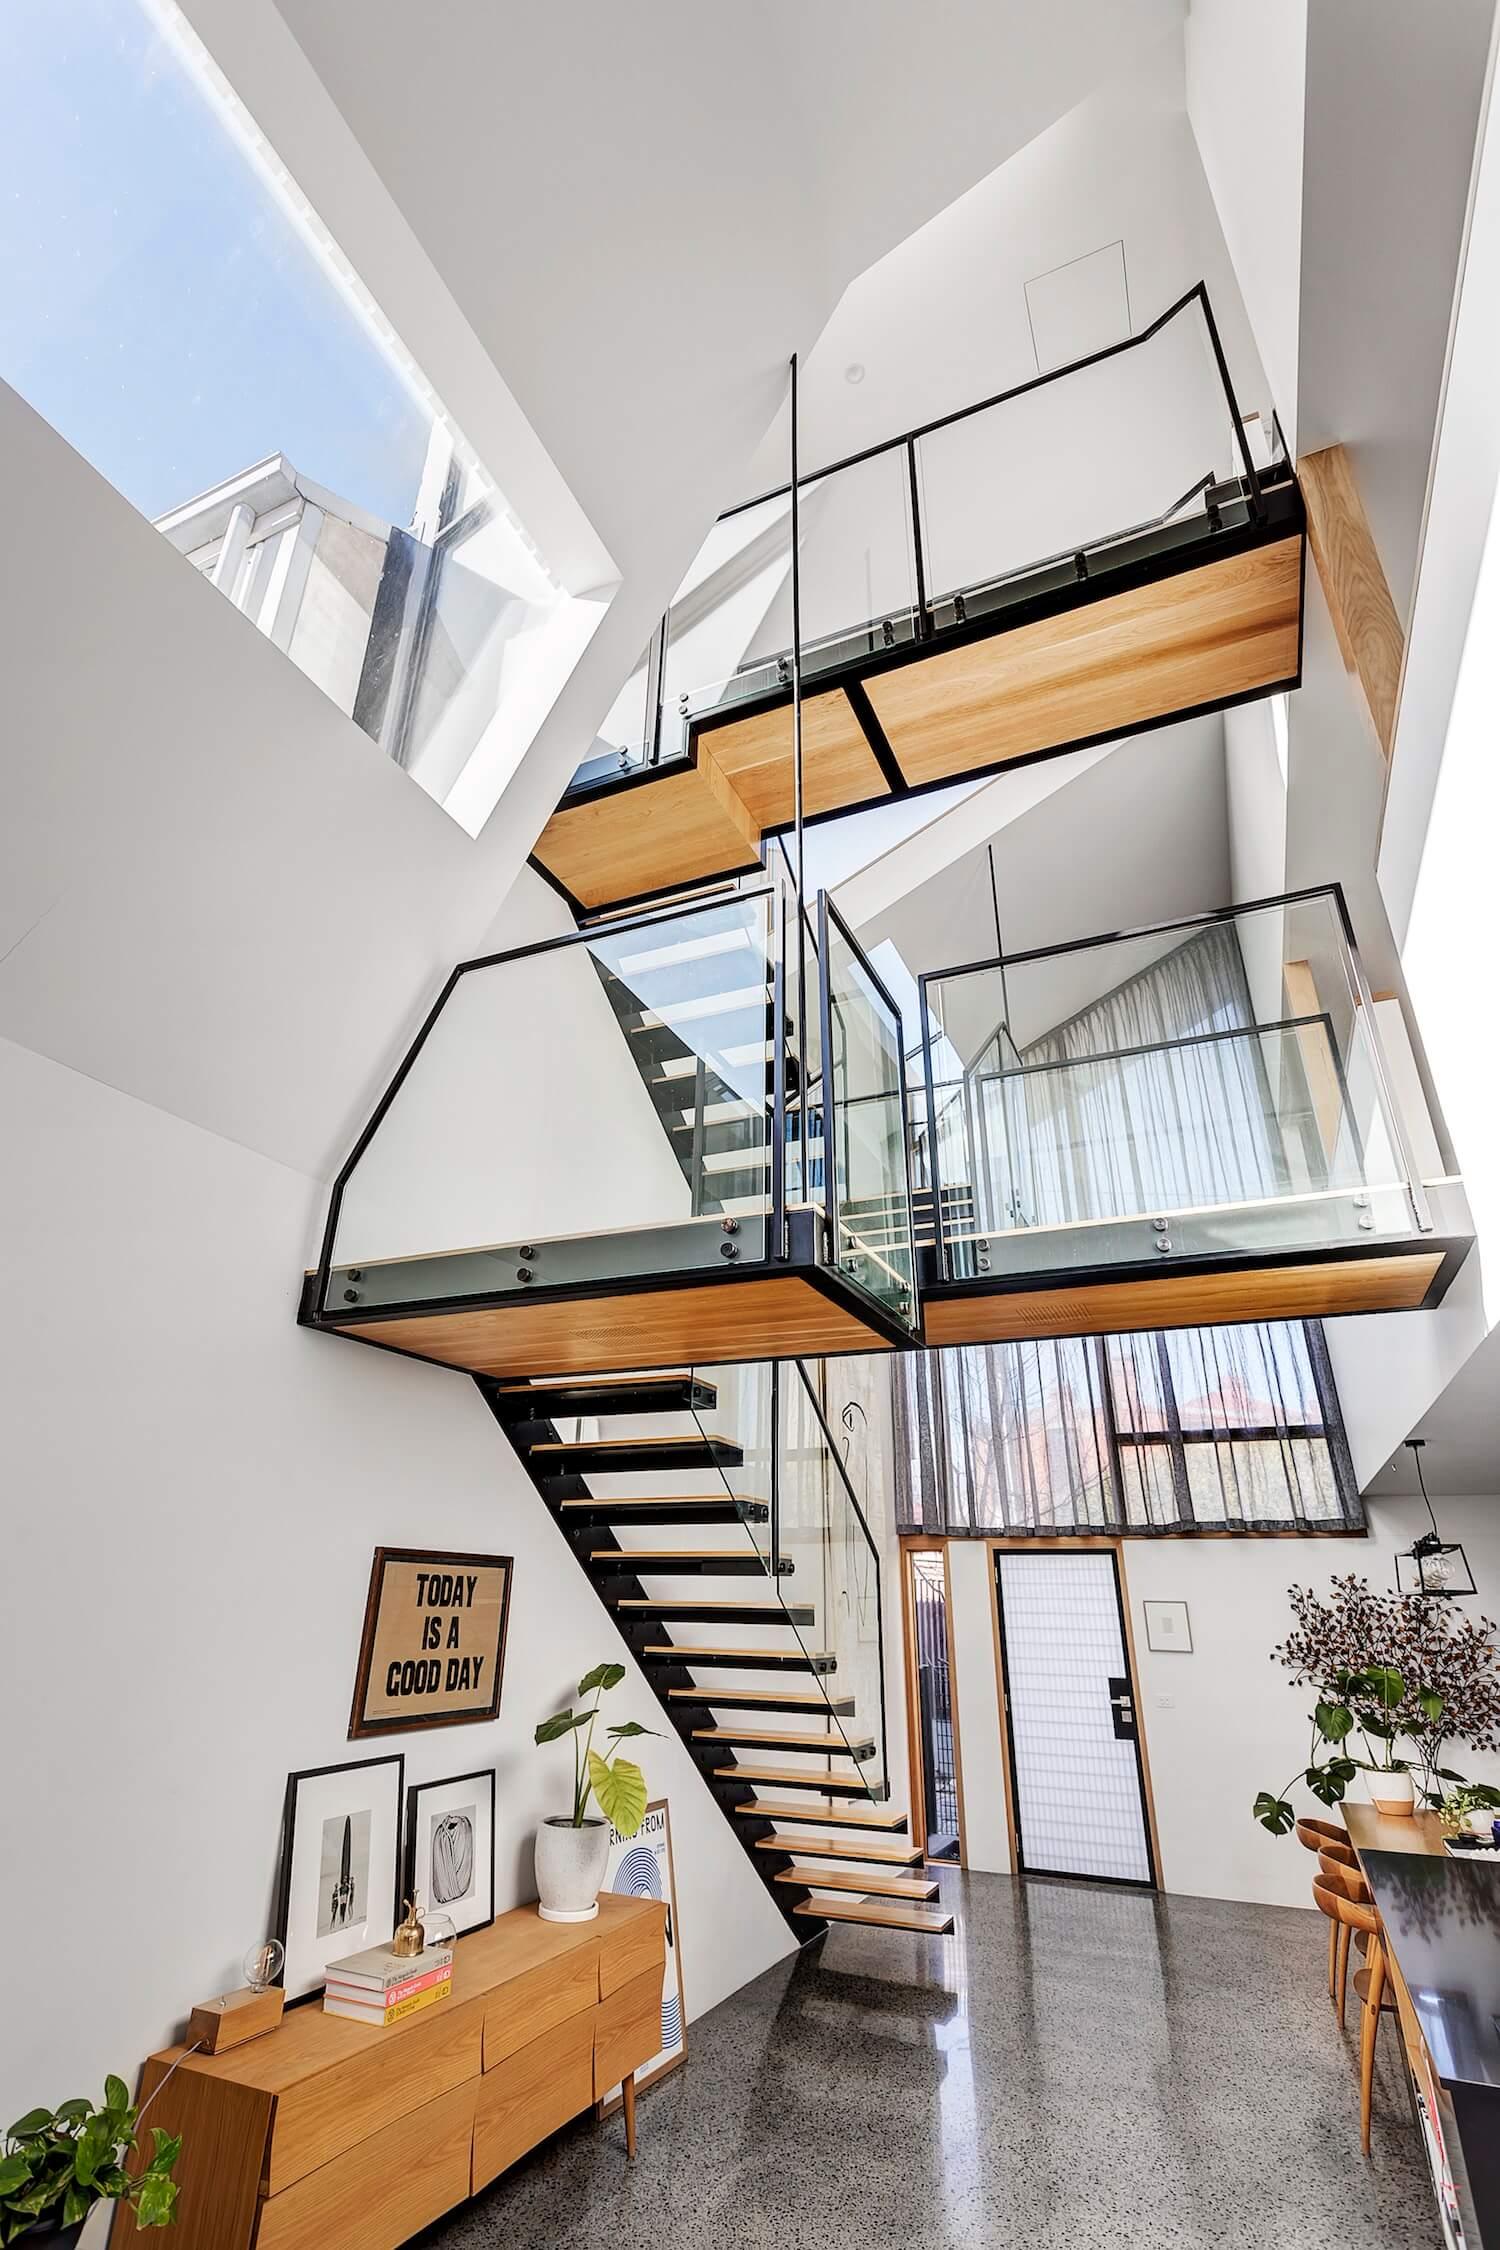 est living open house 15 little george street fitzroy 5